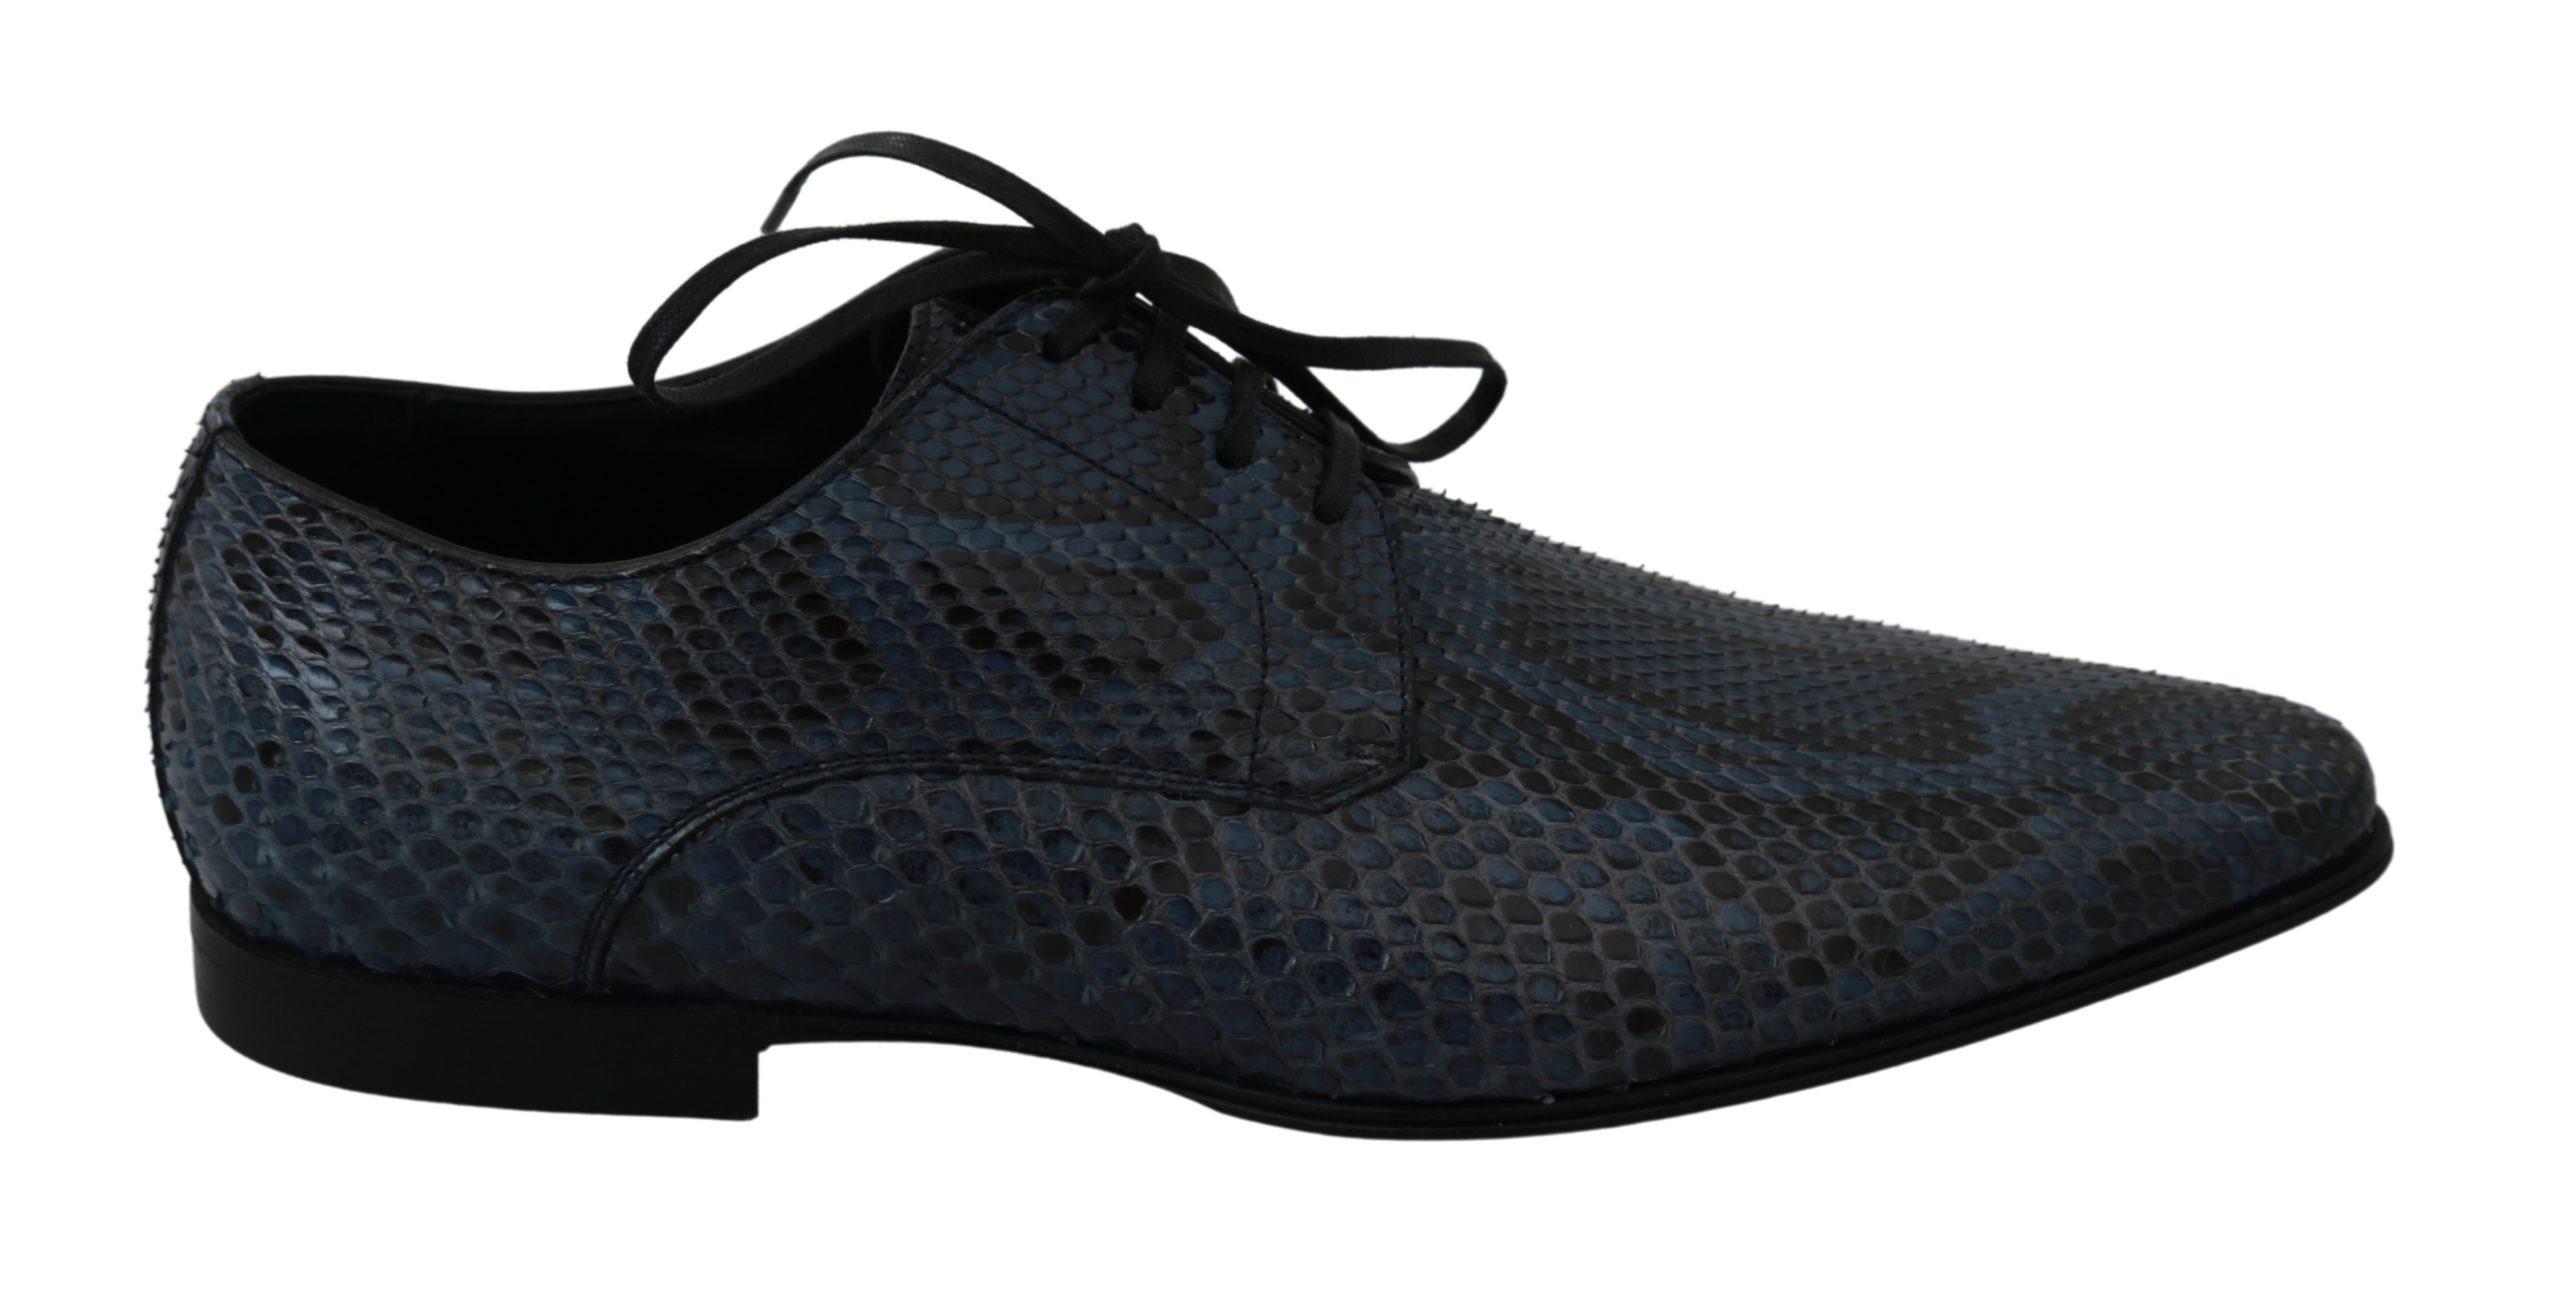 Dolce & Gabbana Men's Python Leather Dress Shoes Blue MV2673 - EU39/US6